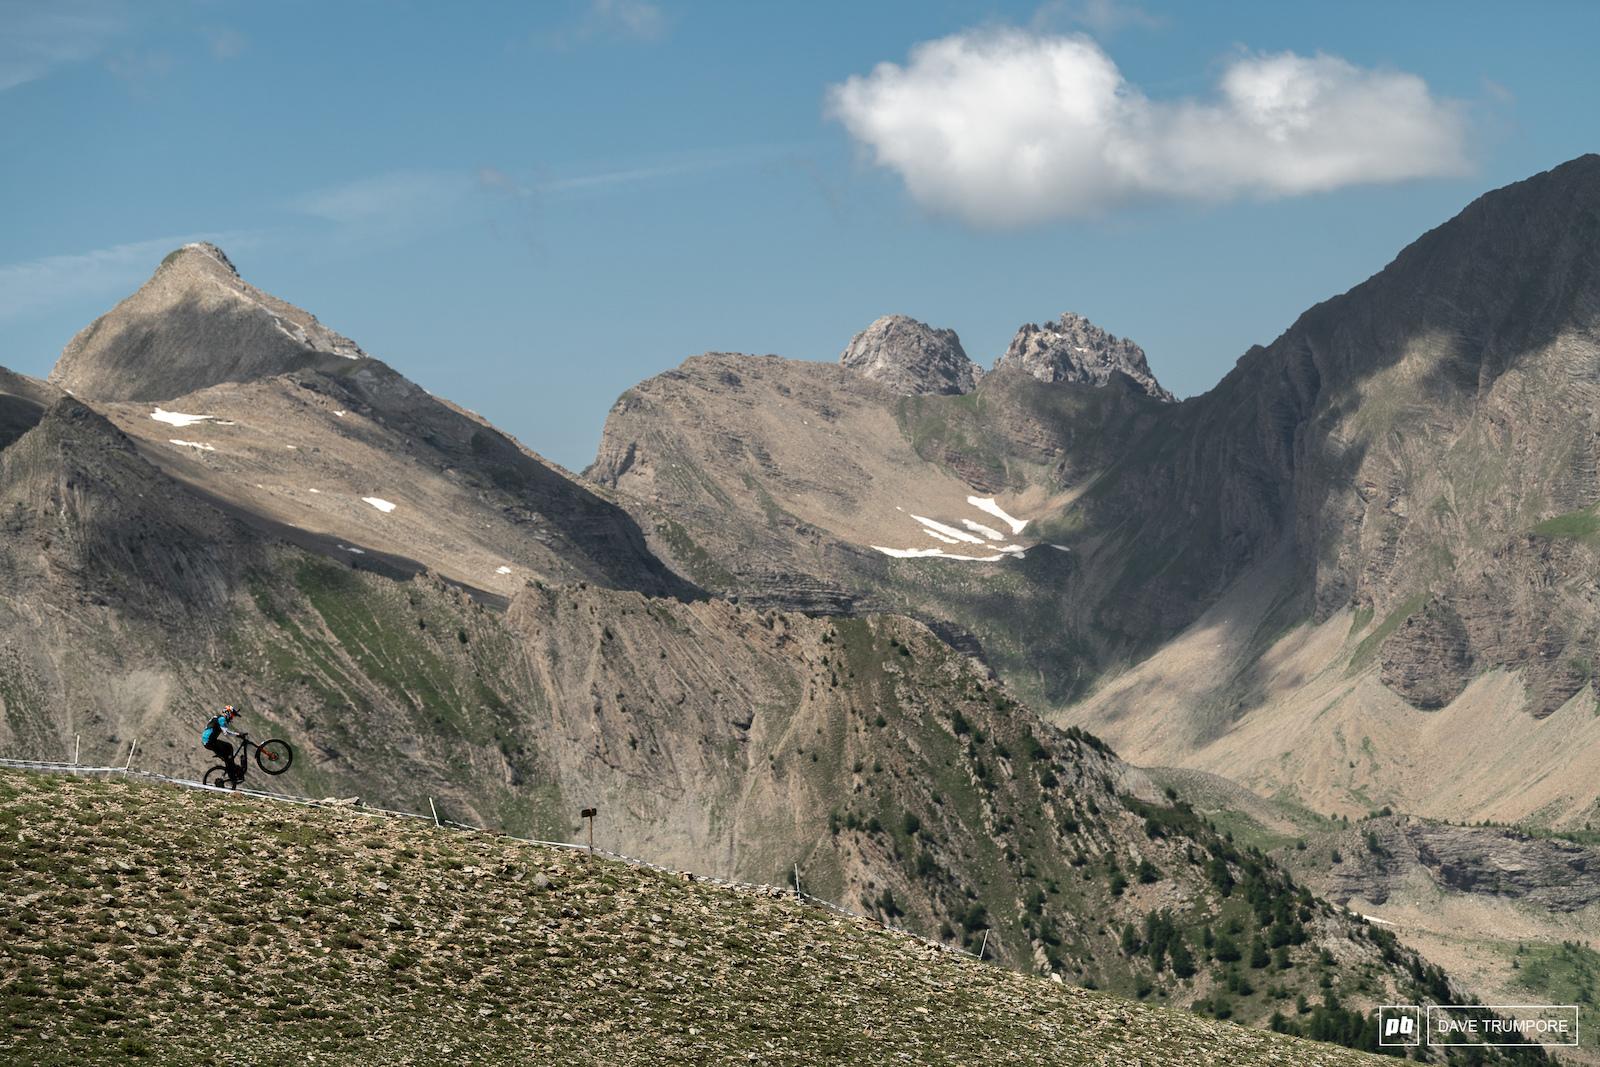 Josh Carlson a ridge line and some big mountains.